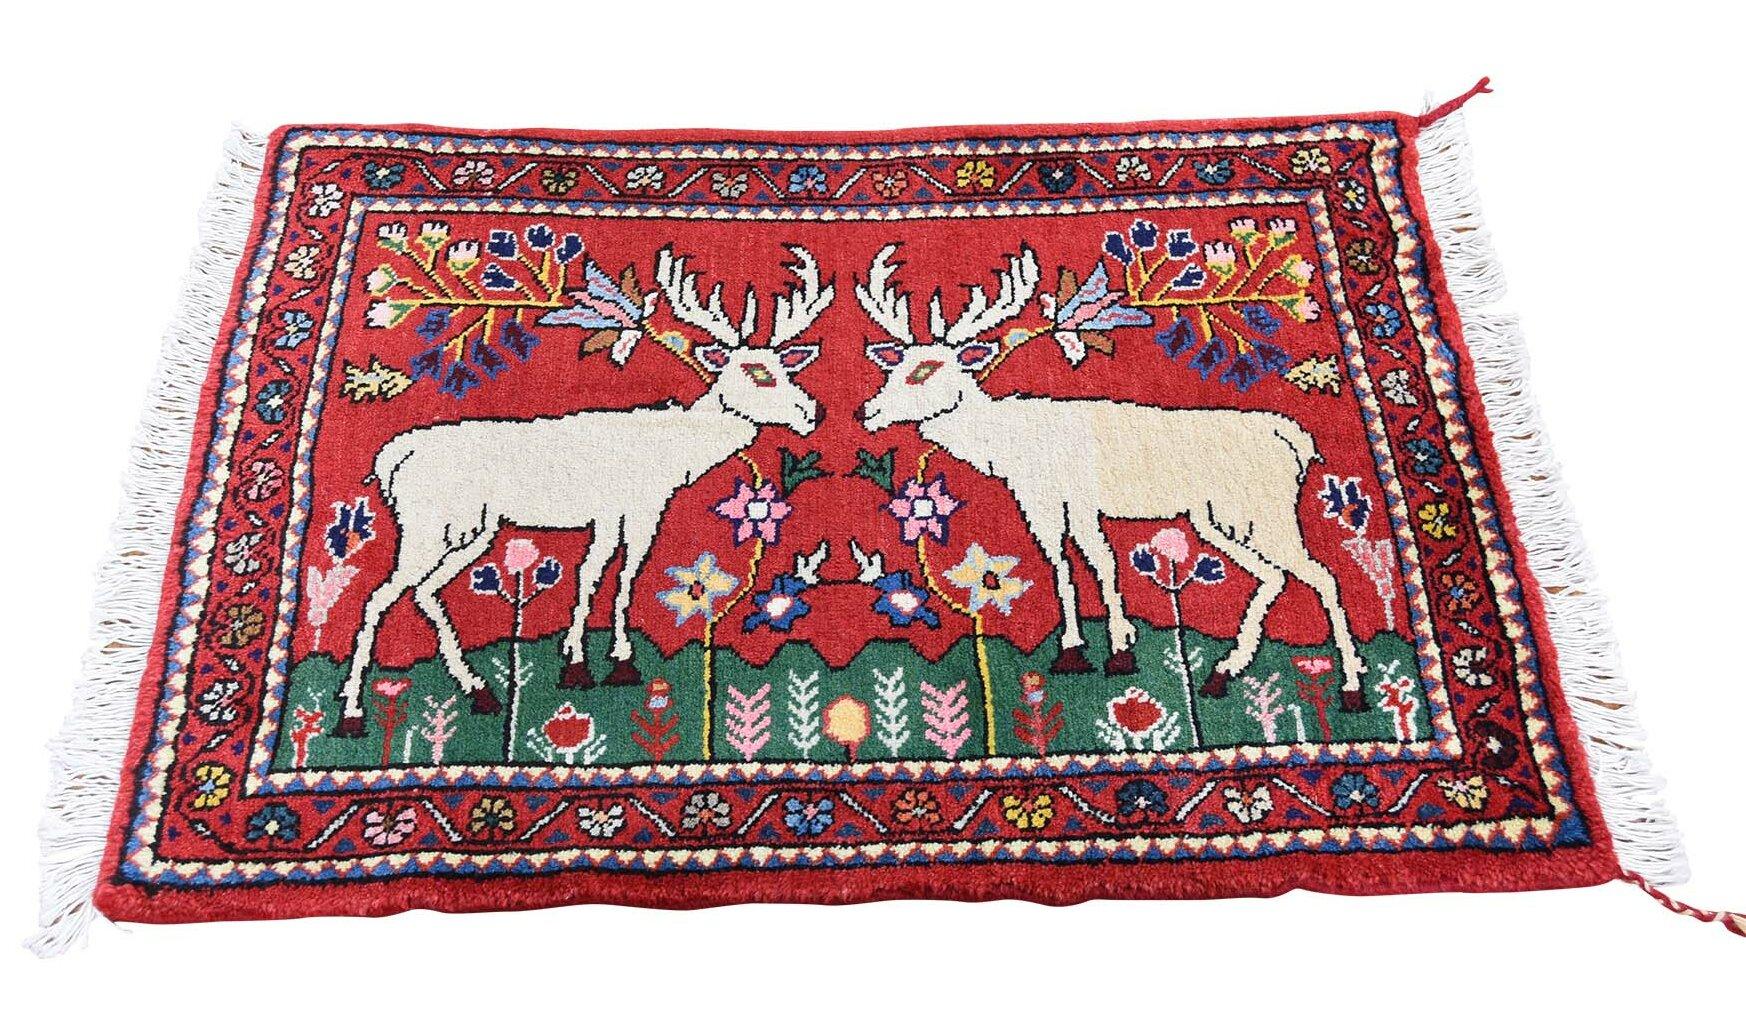 Noe New Pictorial With Deer Tribal Hand